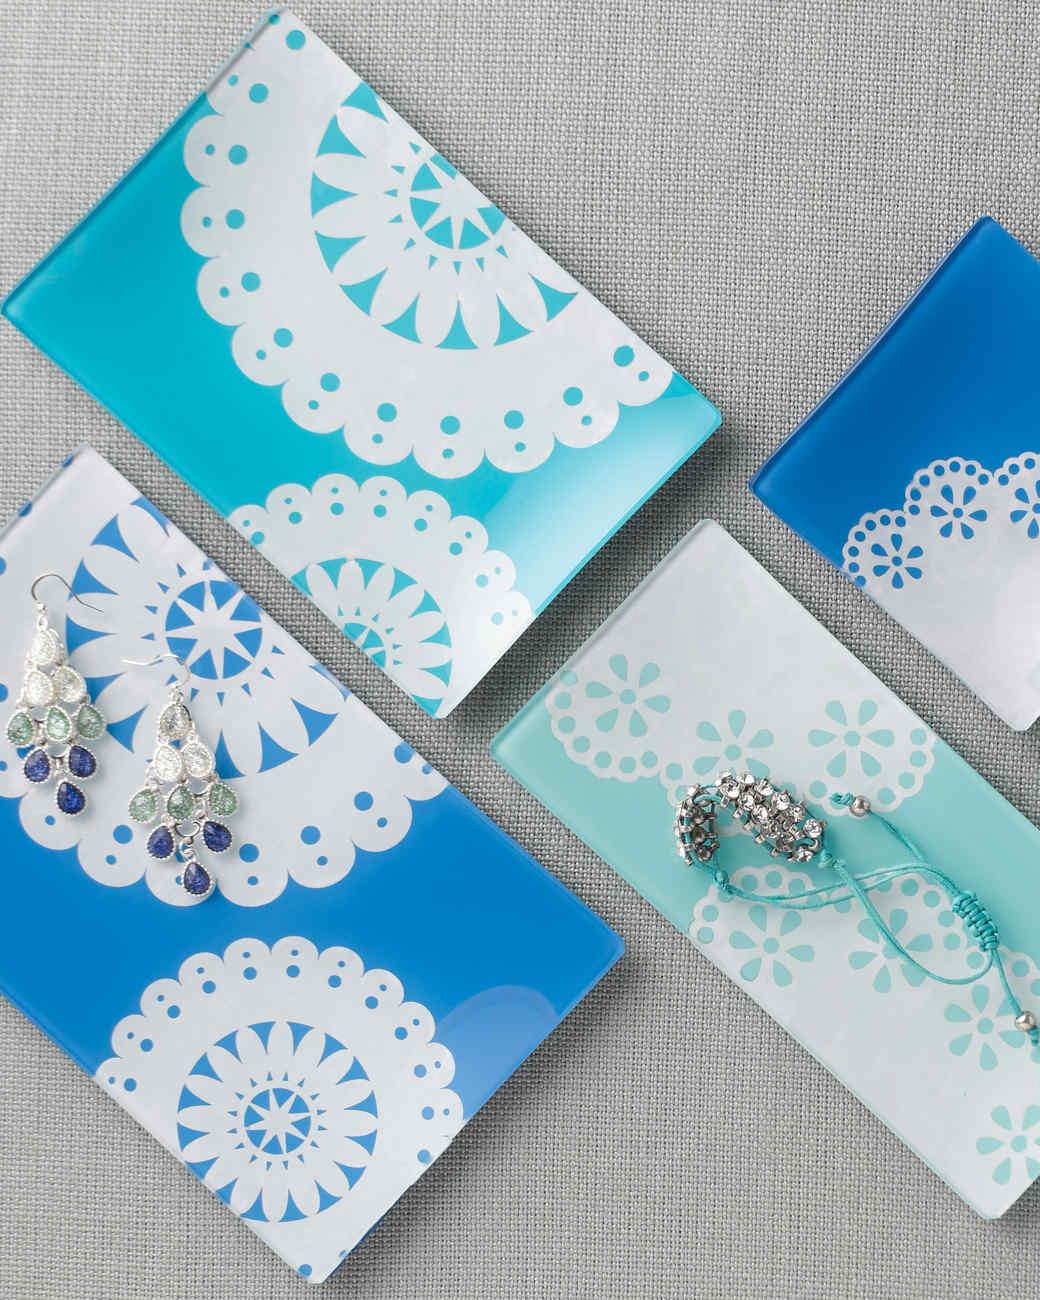 mscrafts-white-doilies-813.jpg